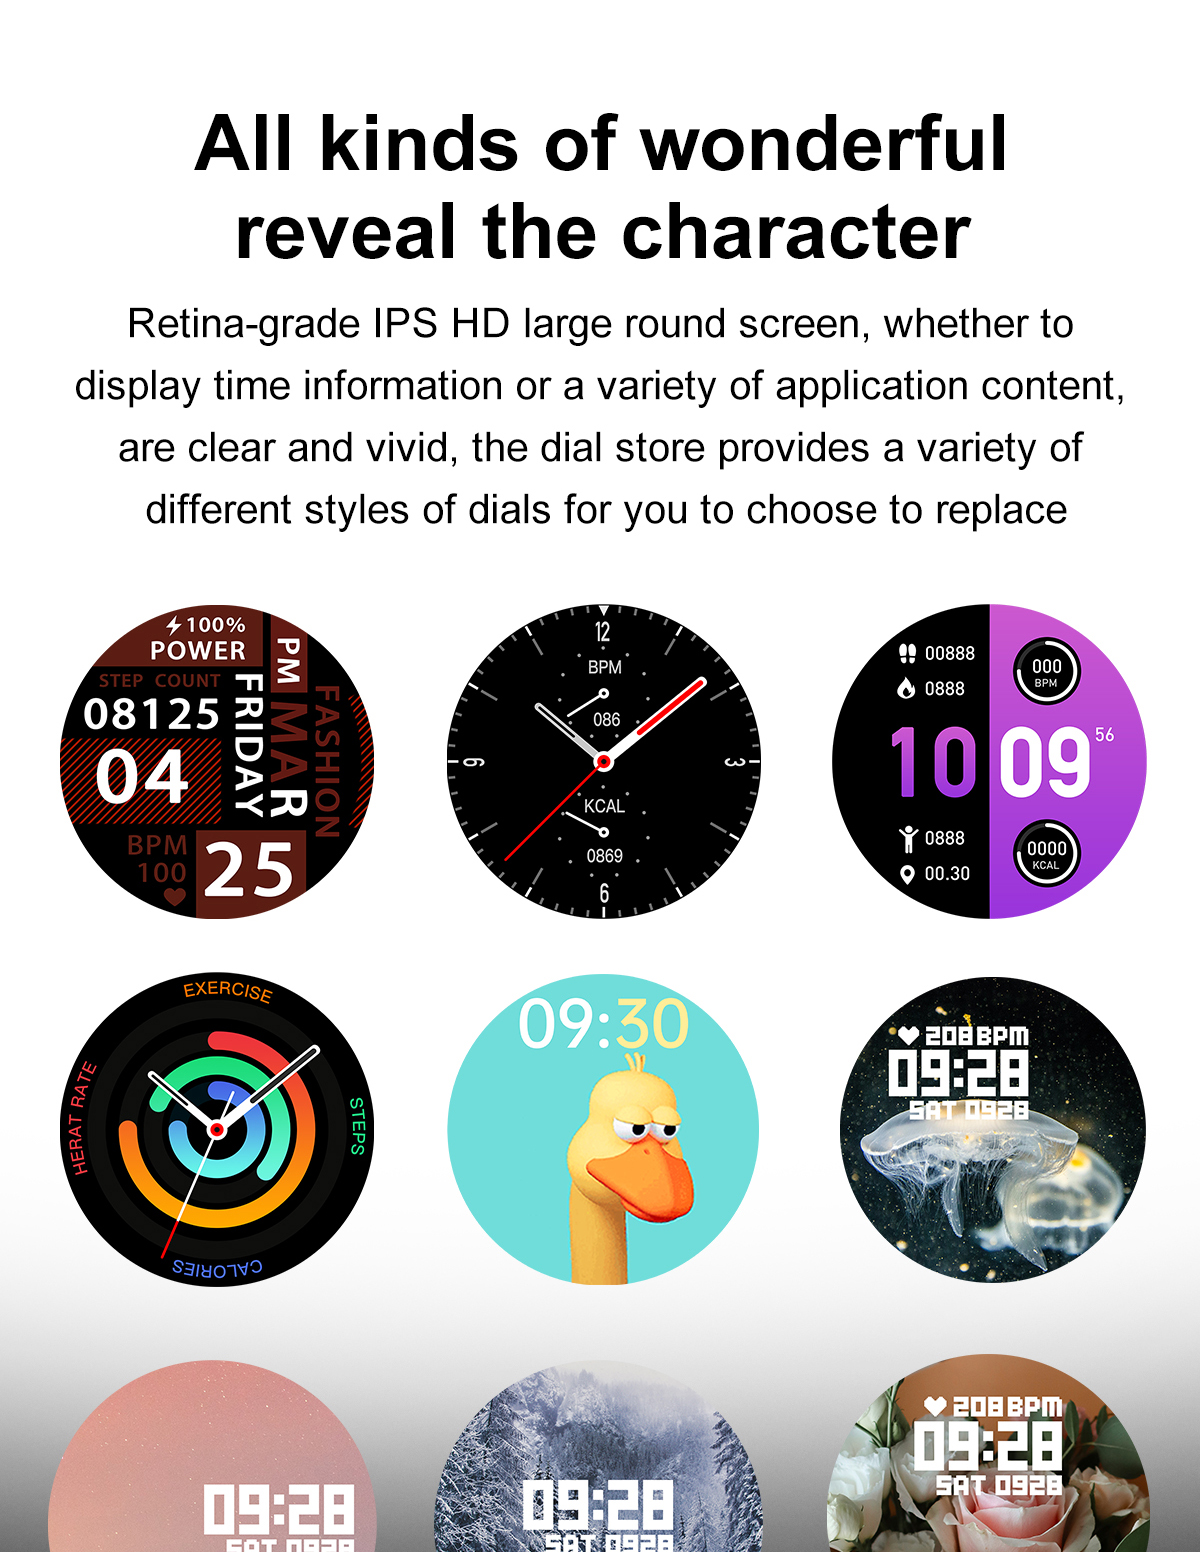 Hea005b3962eb41c2b7855d2cc382ffacm 2021 NEW Smart Watch Women Men Full Touch Fitness Tracker IP67 Waterproof Smartwatch For Android Xiaomi Redmi